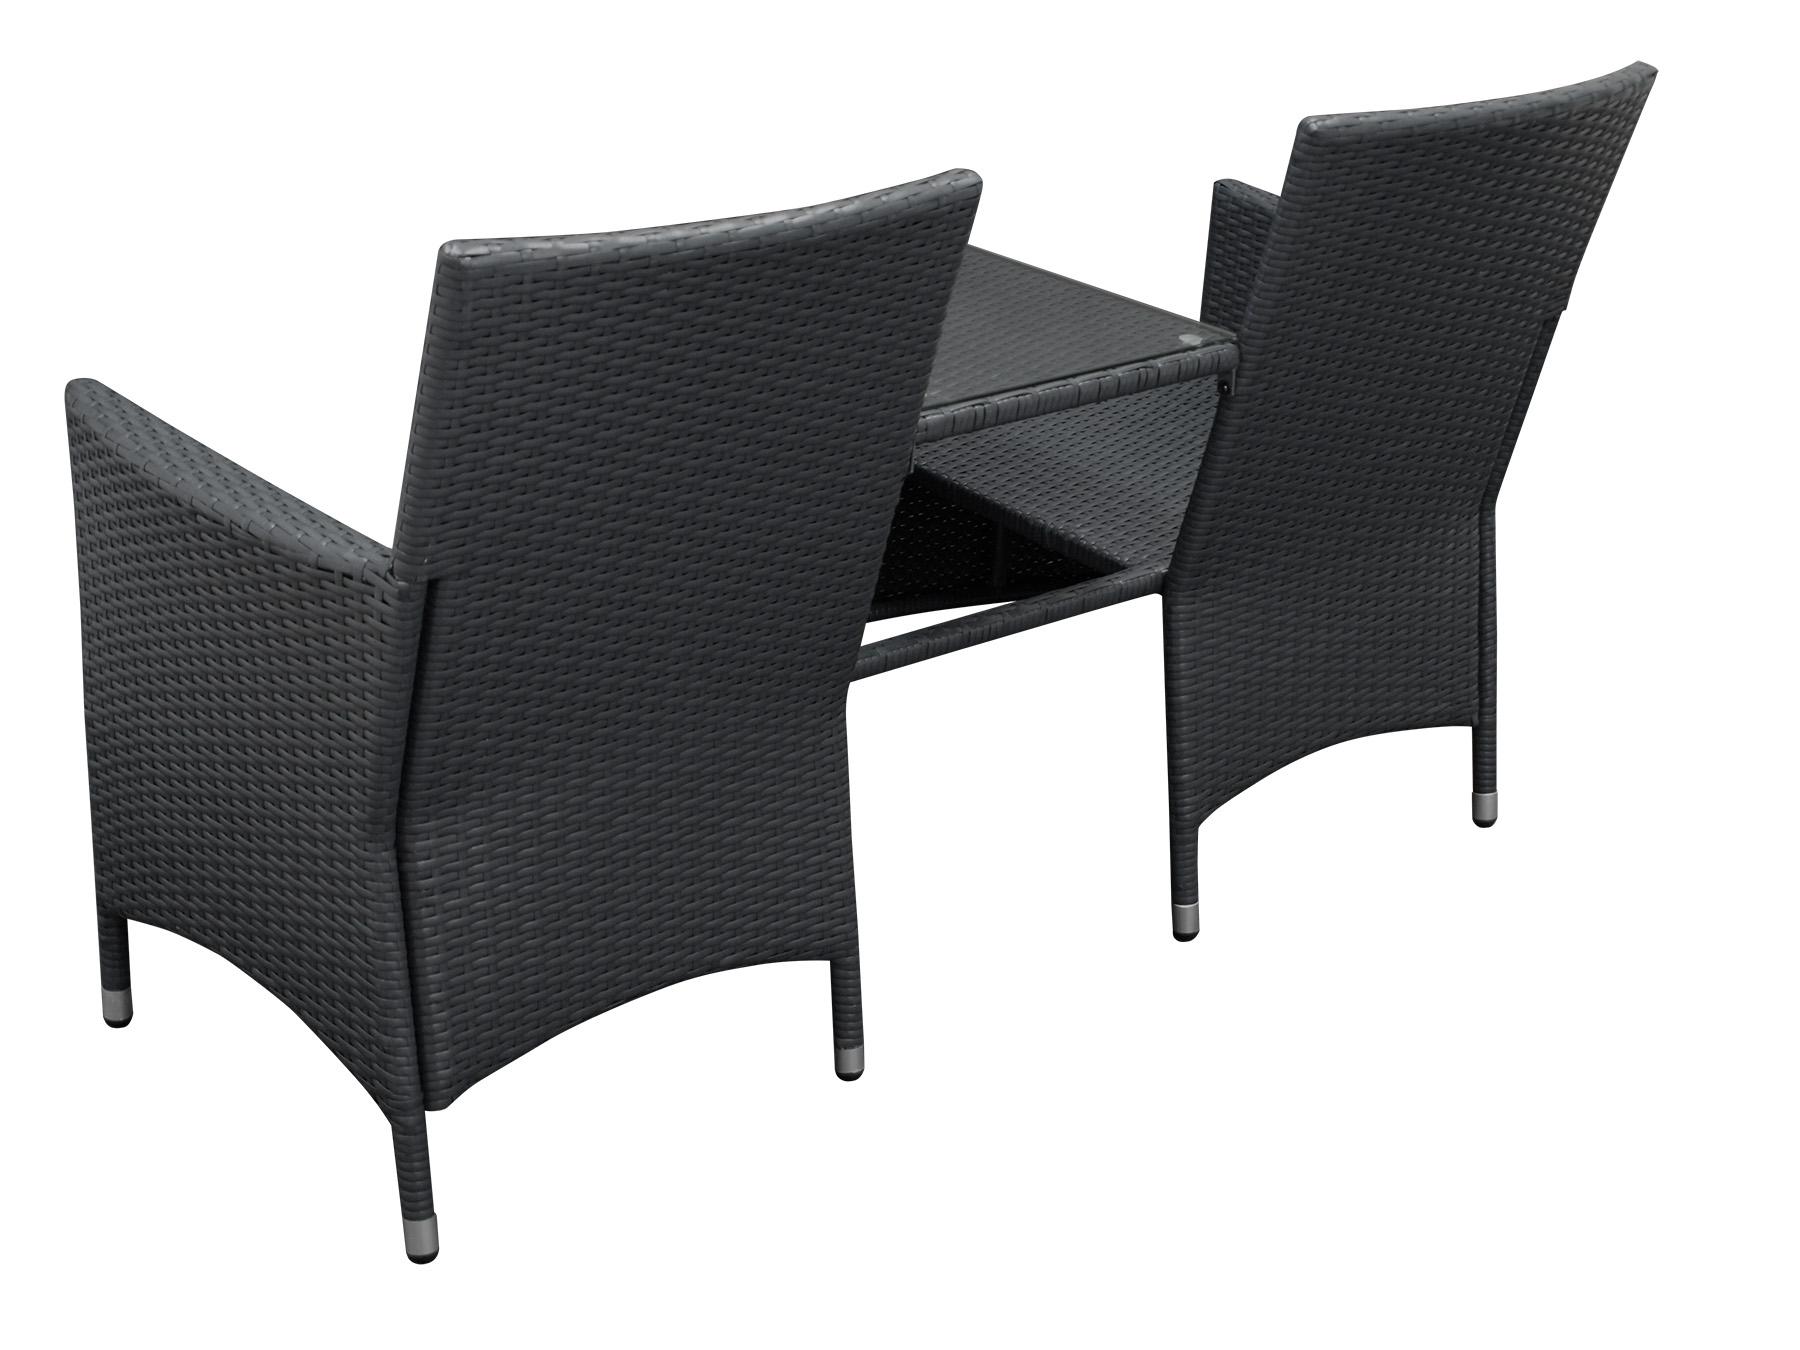 gartenbank rattanbank mit tisch gartenm bel bank san vincenzo rattan grau ebay. Black Bedroom Furniture Sets. Home Design Ideas